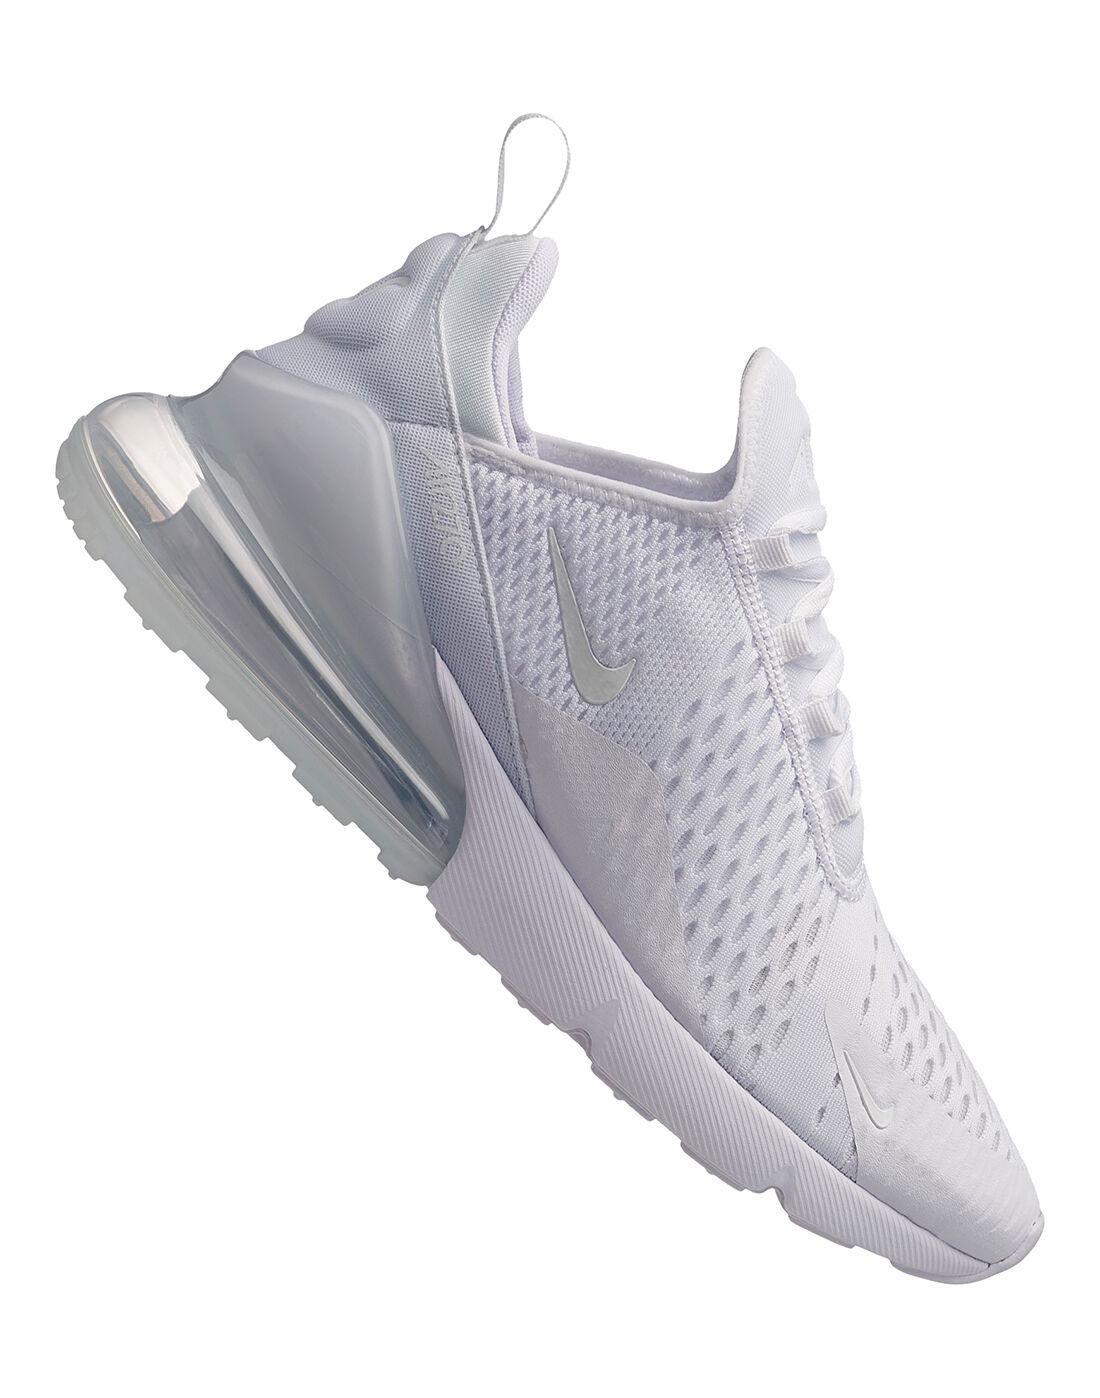 Men's Triple White Nike Air Max 270